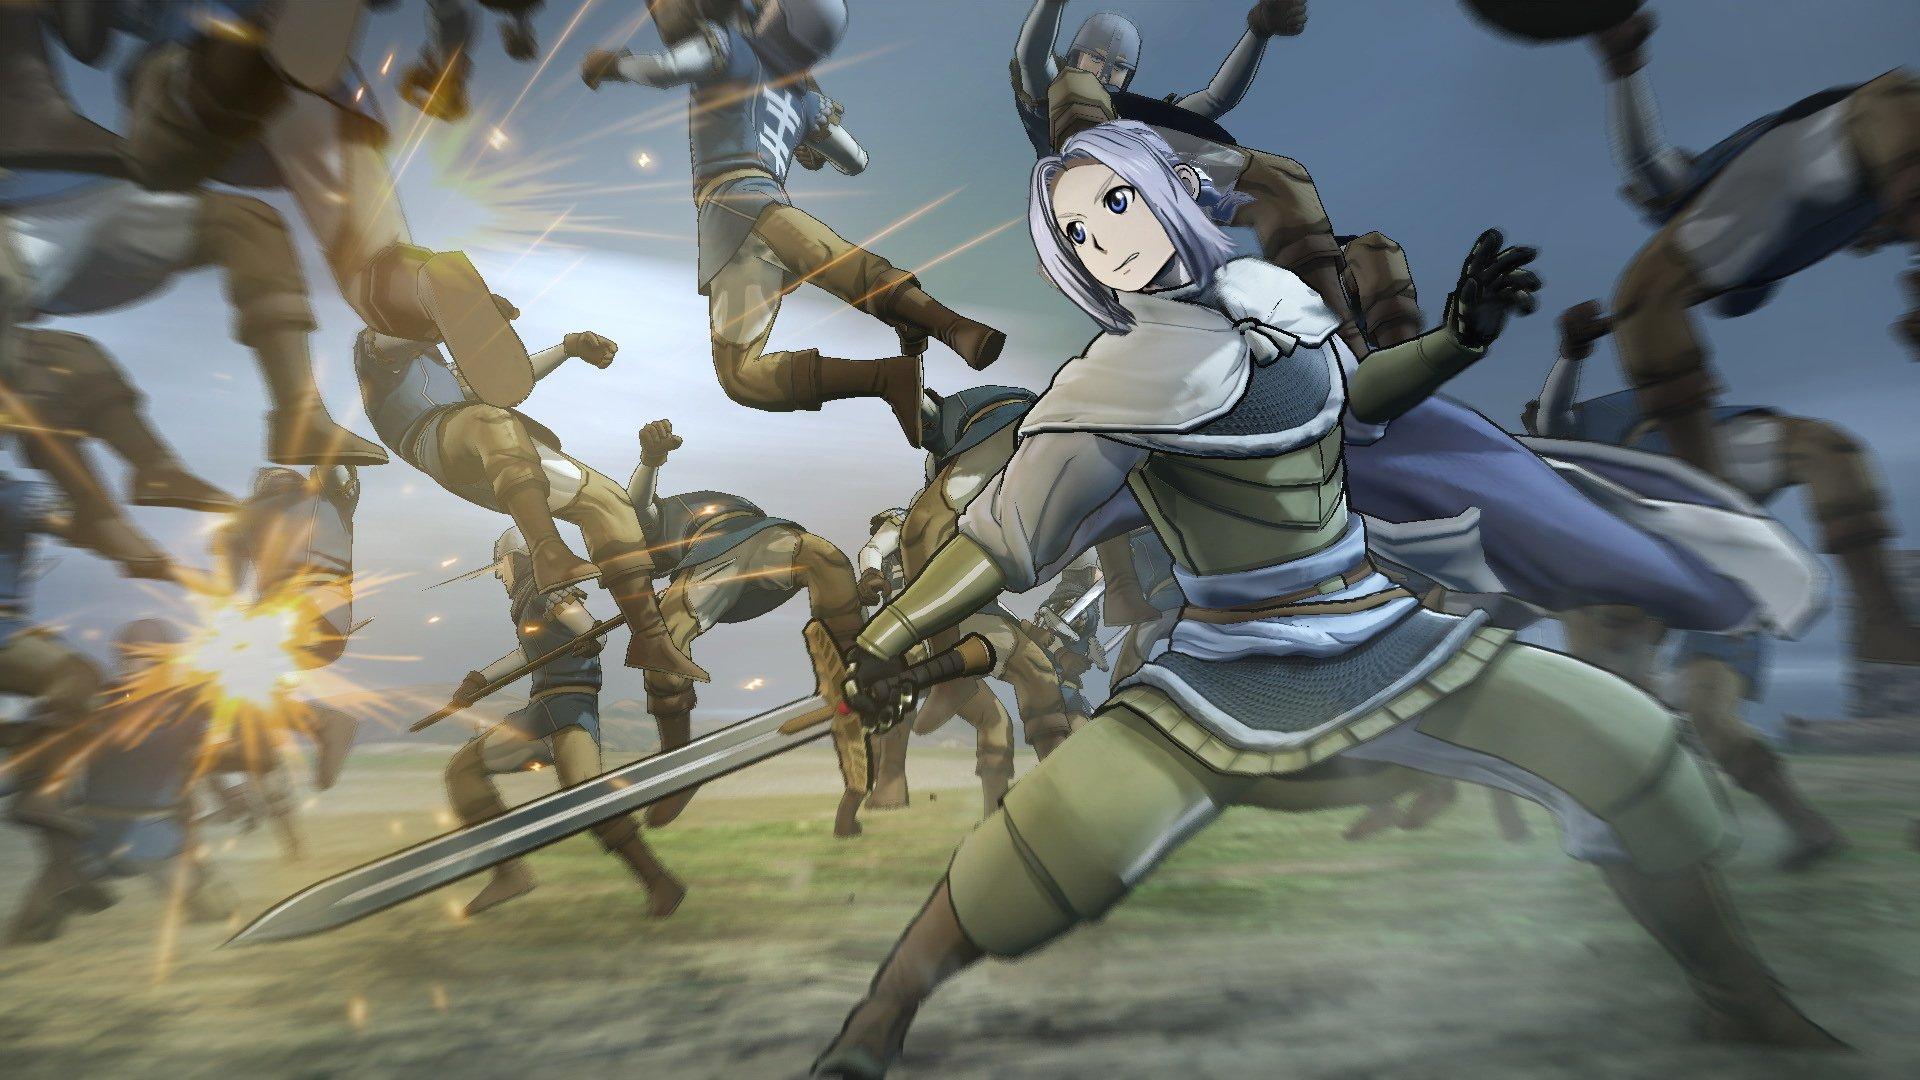 Arslan_Battle_5 Arslan: The Warriors of Legend Preview